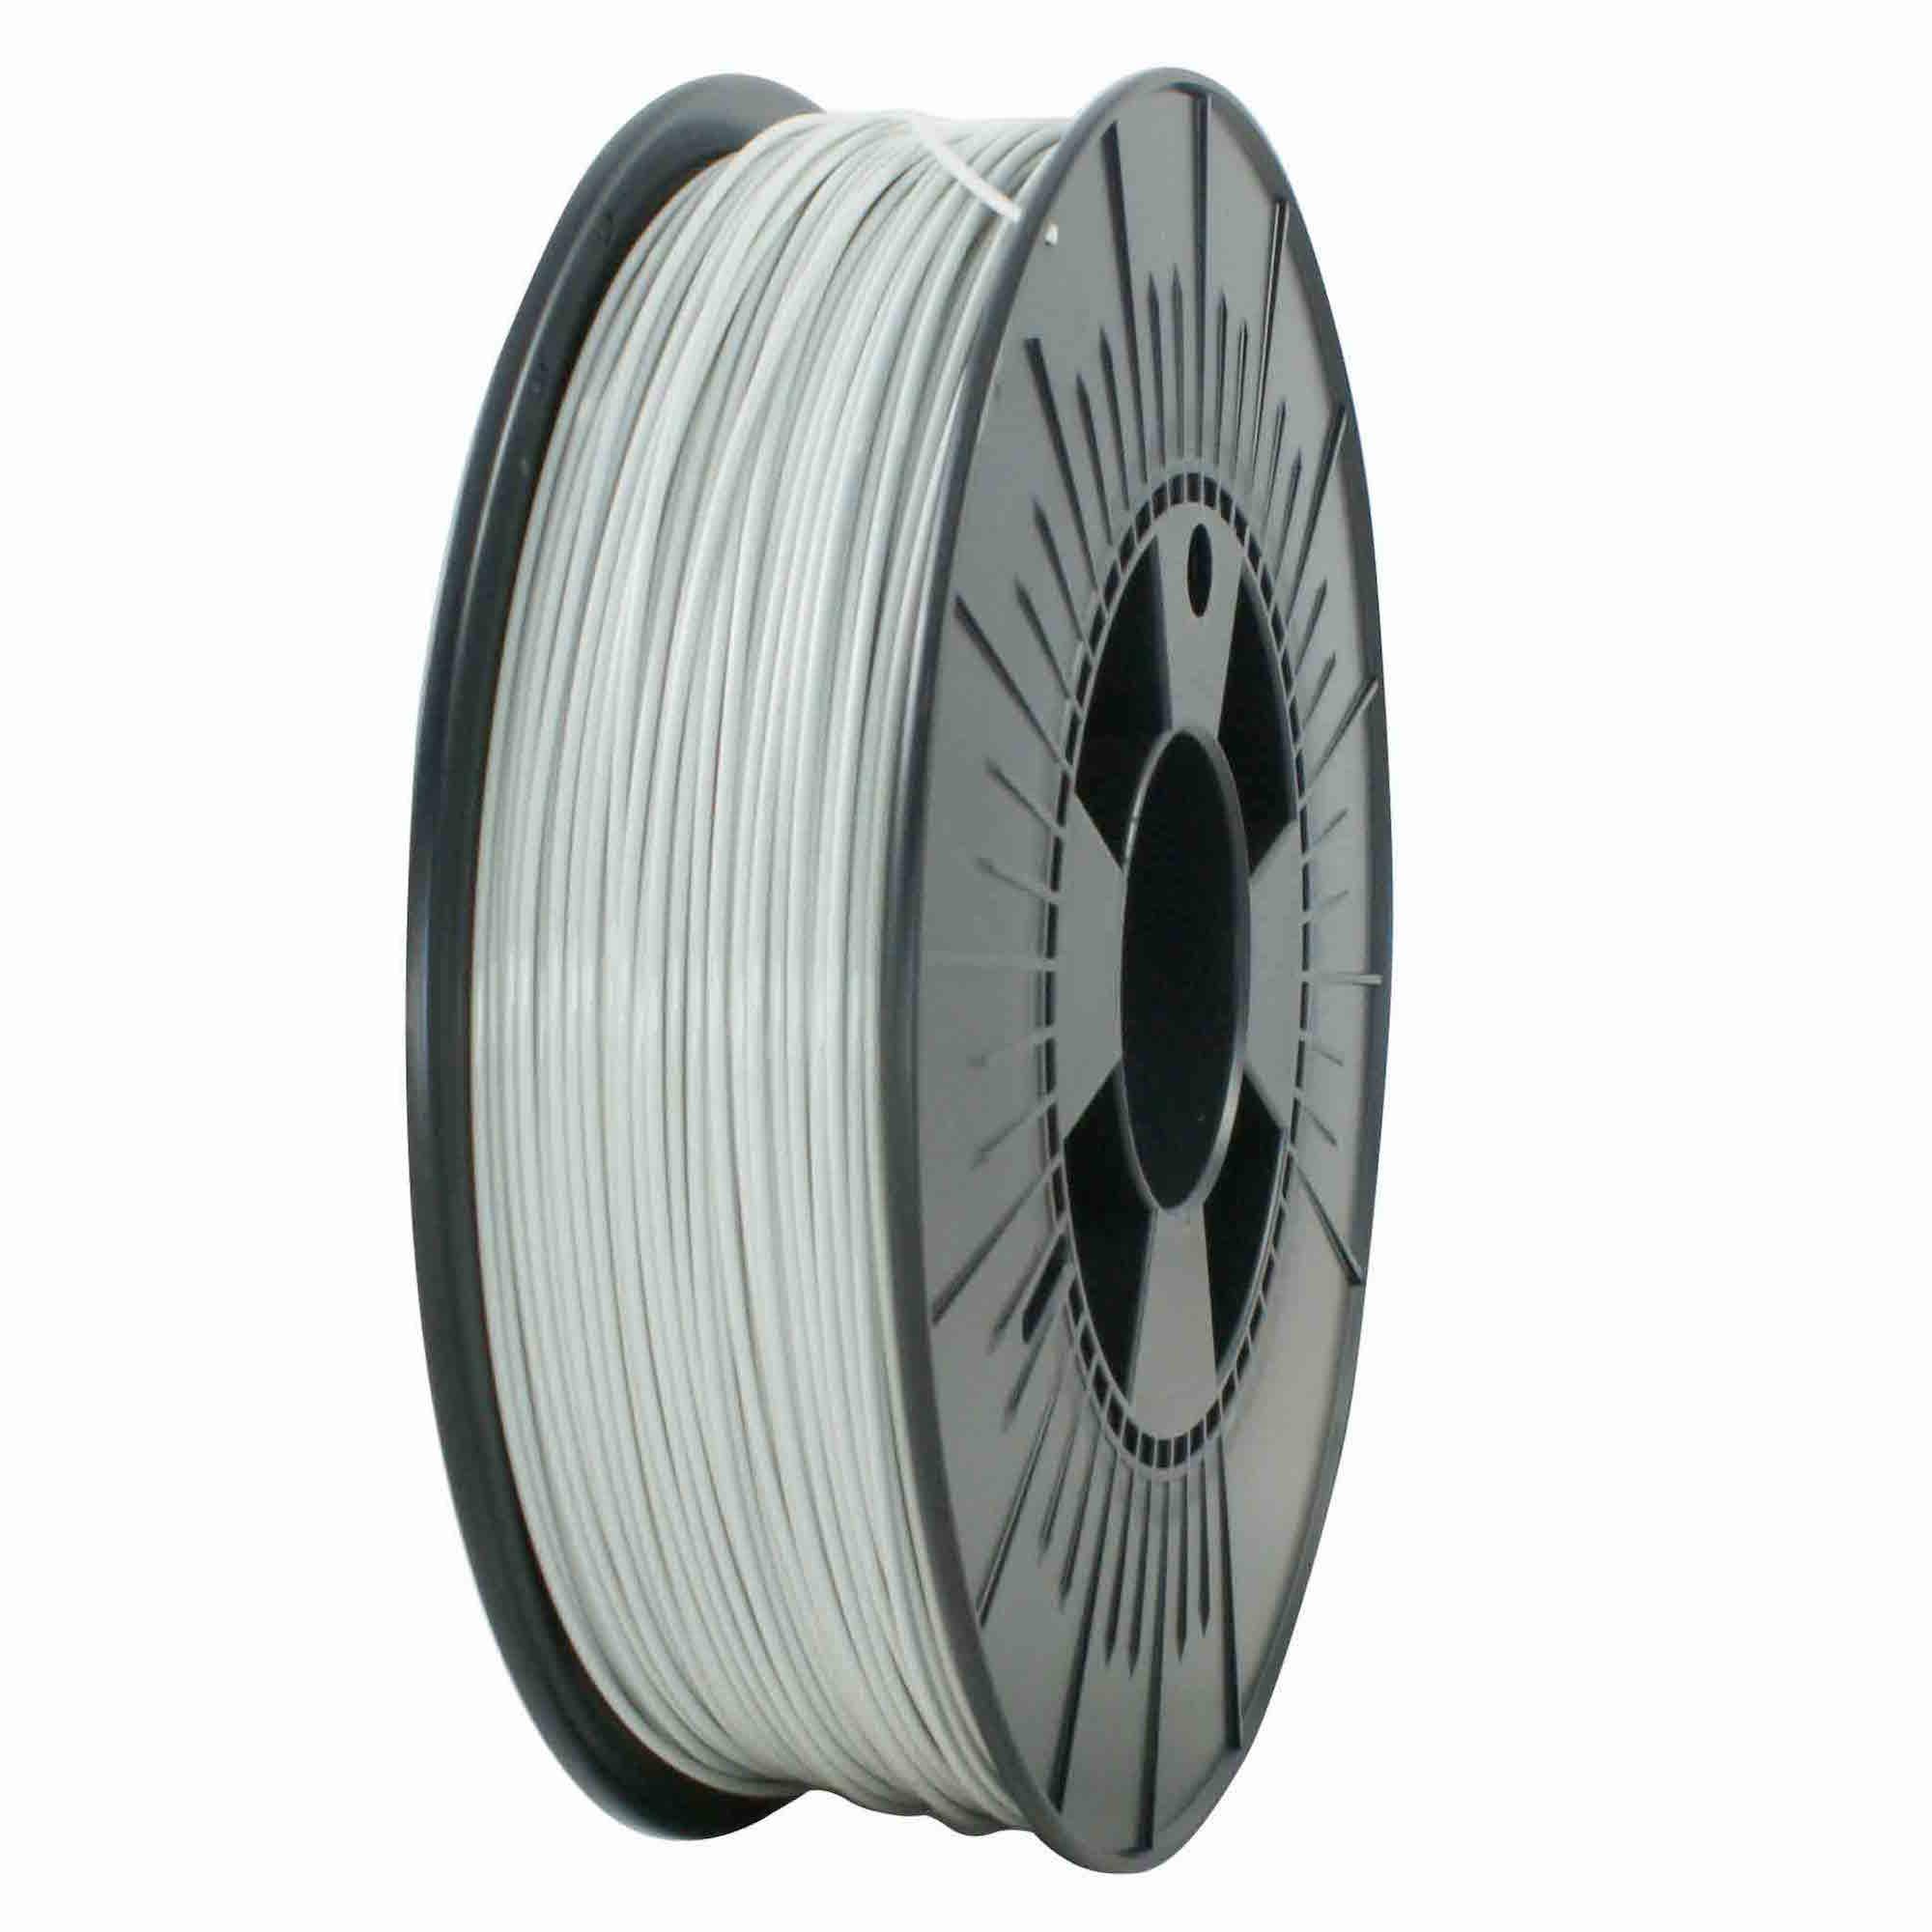 BioPC 500g – Engineering 3D Printer Filament